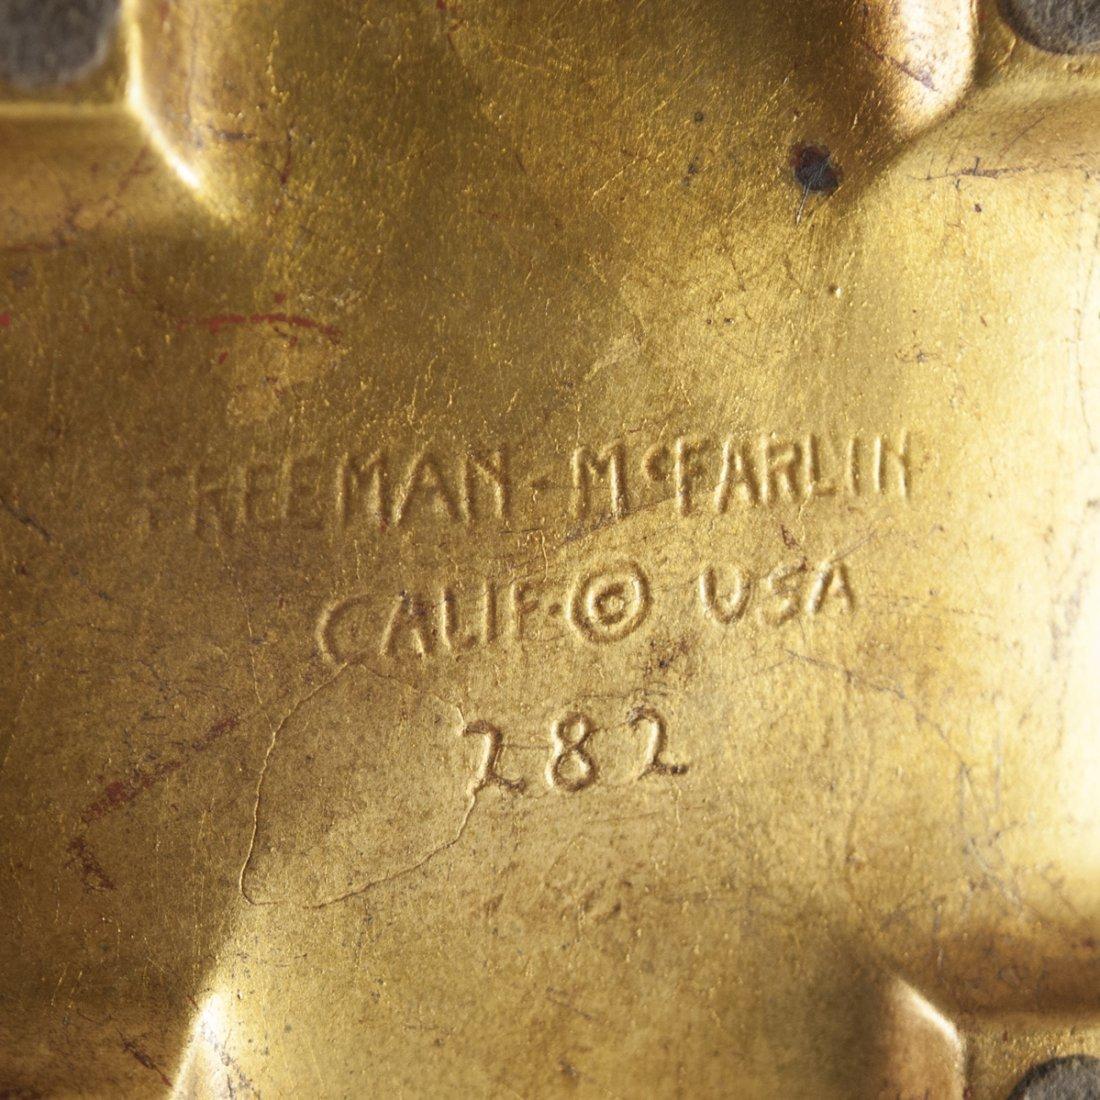 Freeman-Mcfarlin Ceramic Ashtray - 2